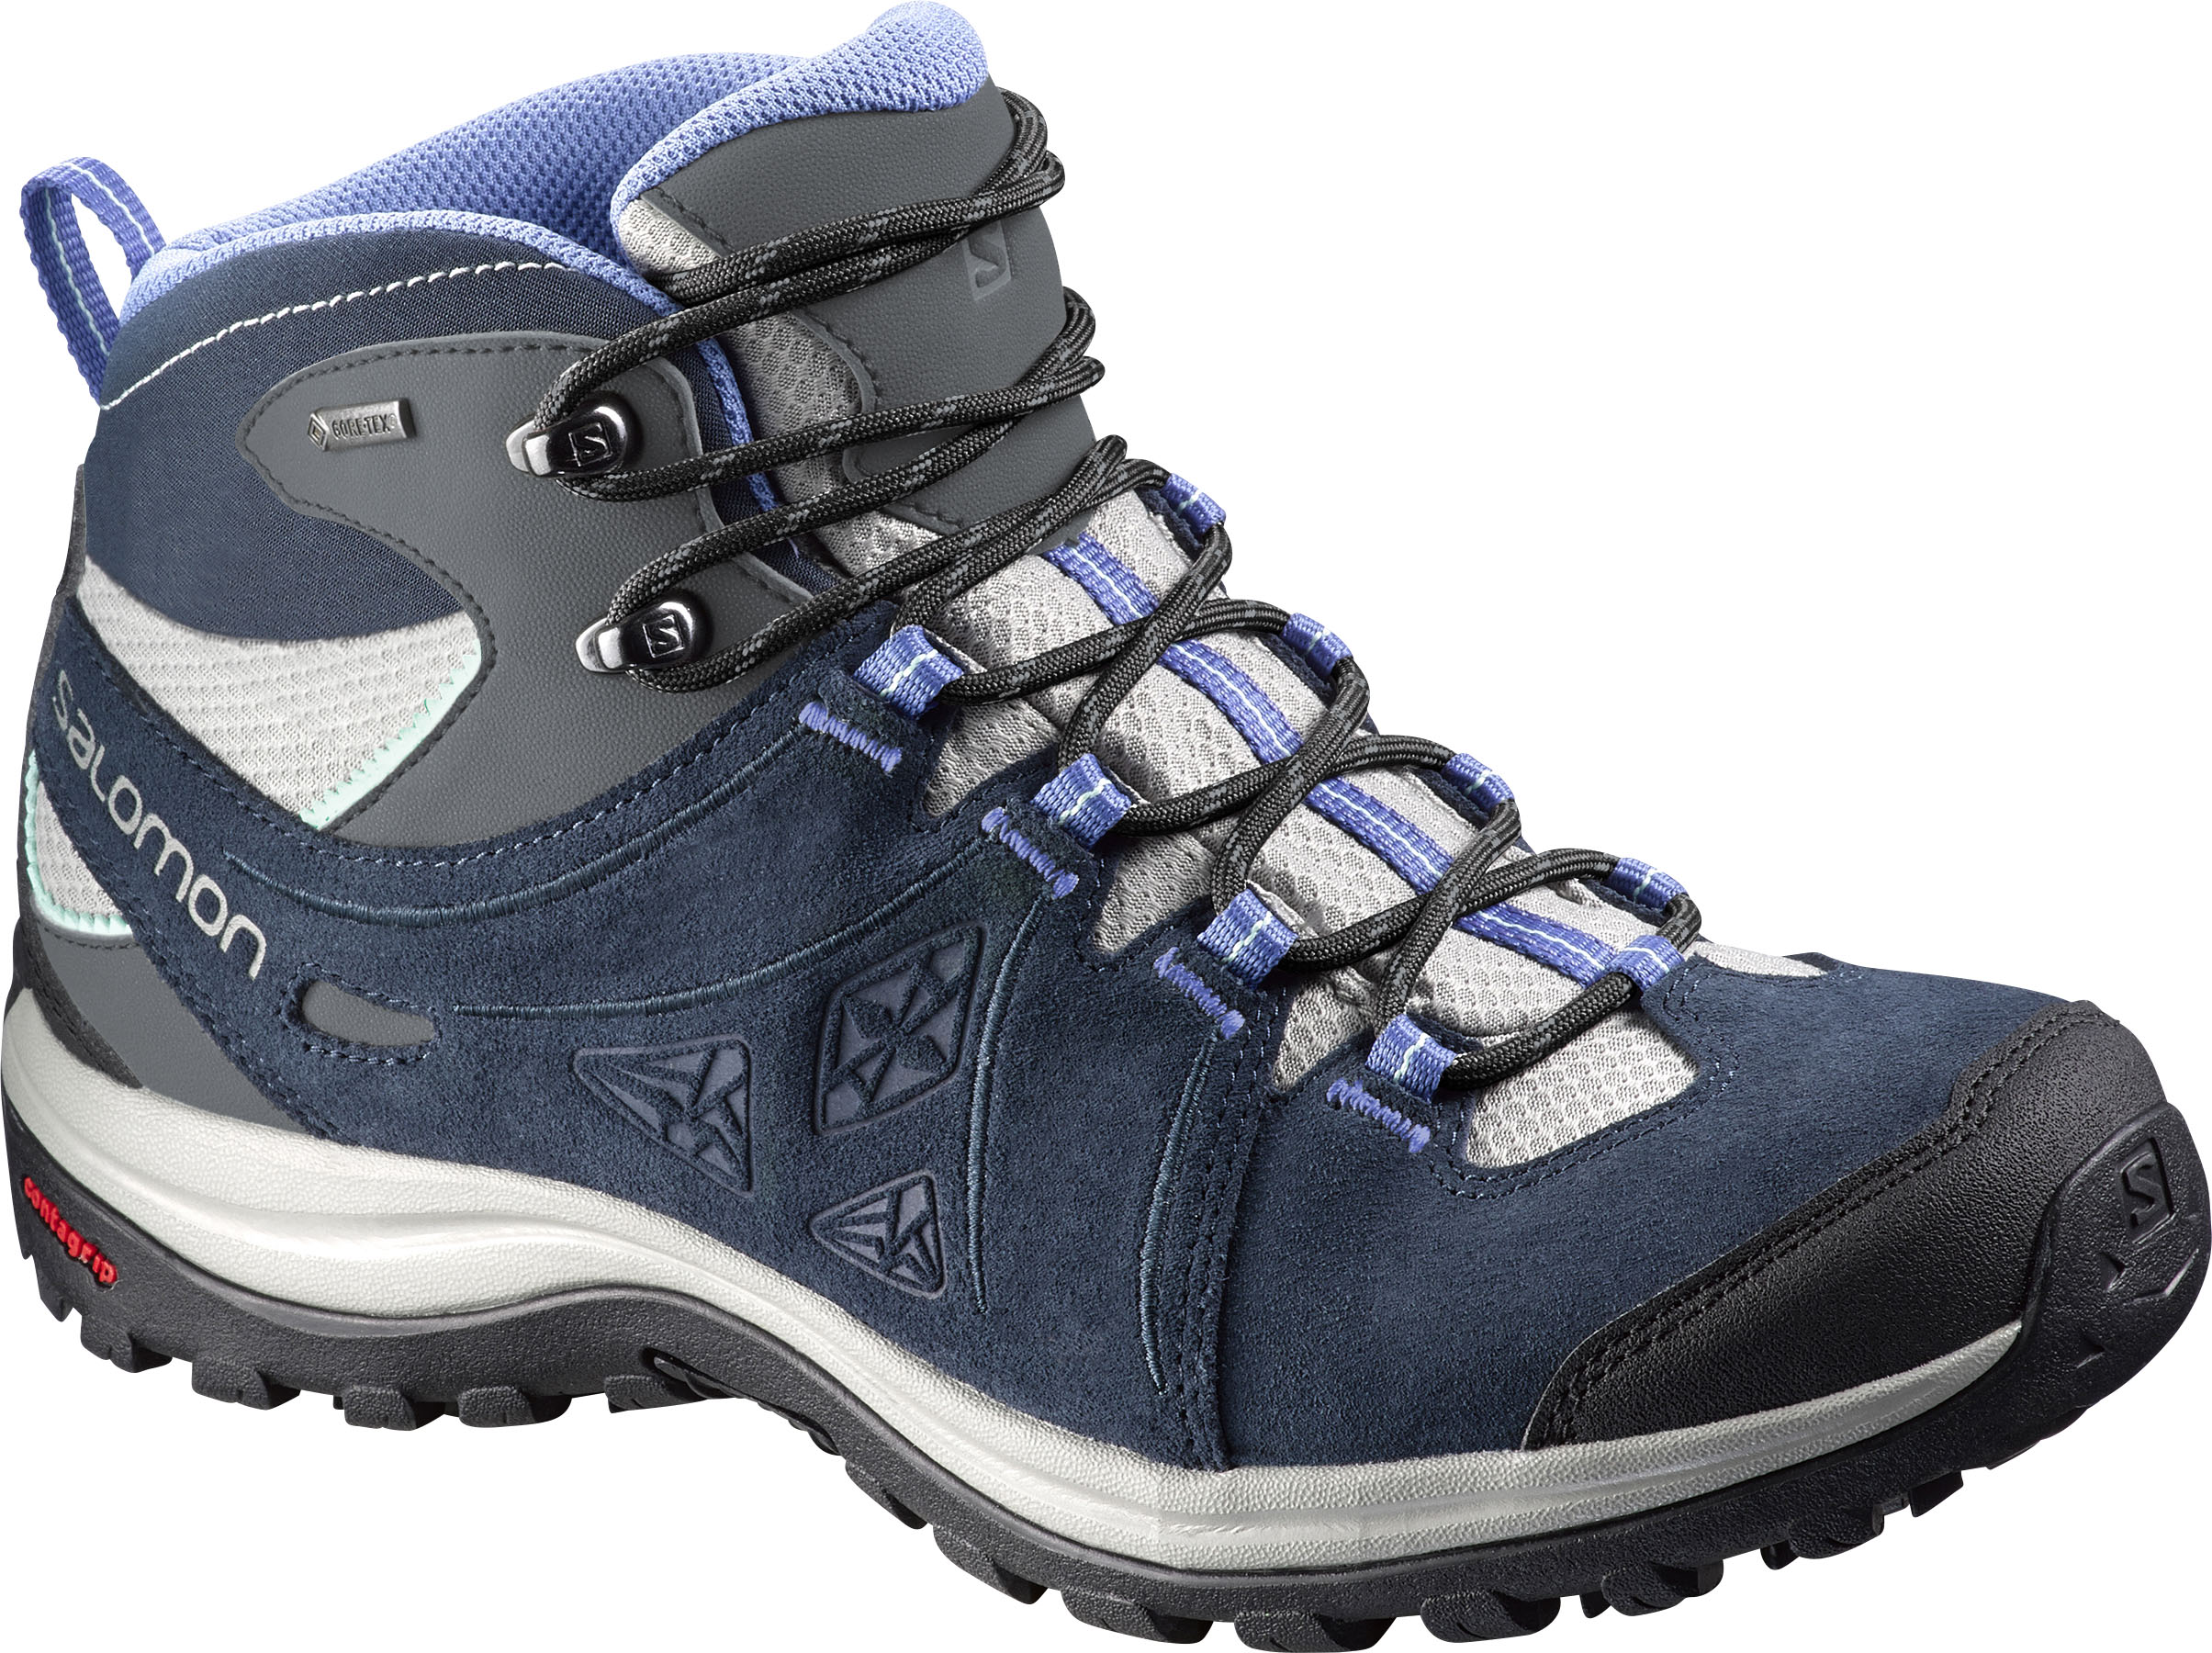 Salomon Ellipse 2 MID LTR GTX W 379179 modrá 36